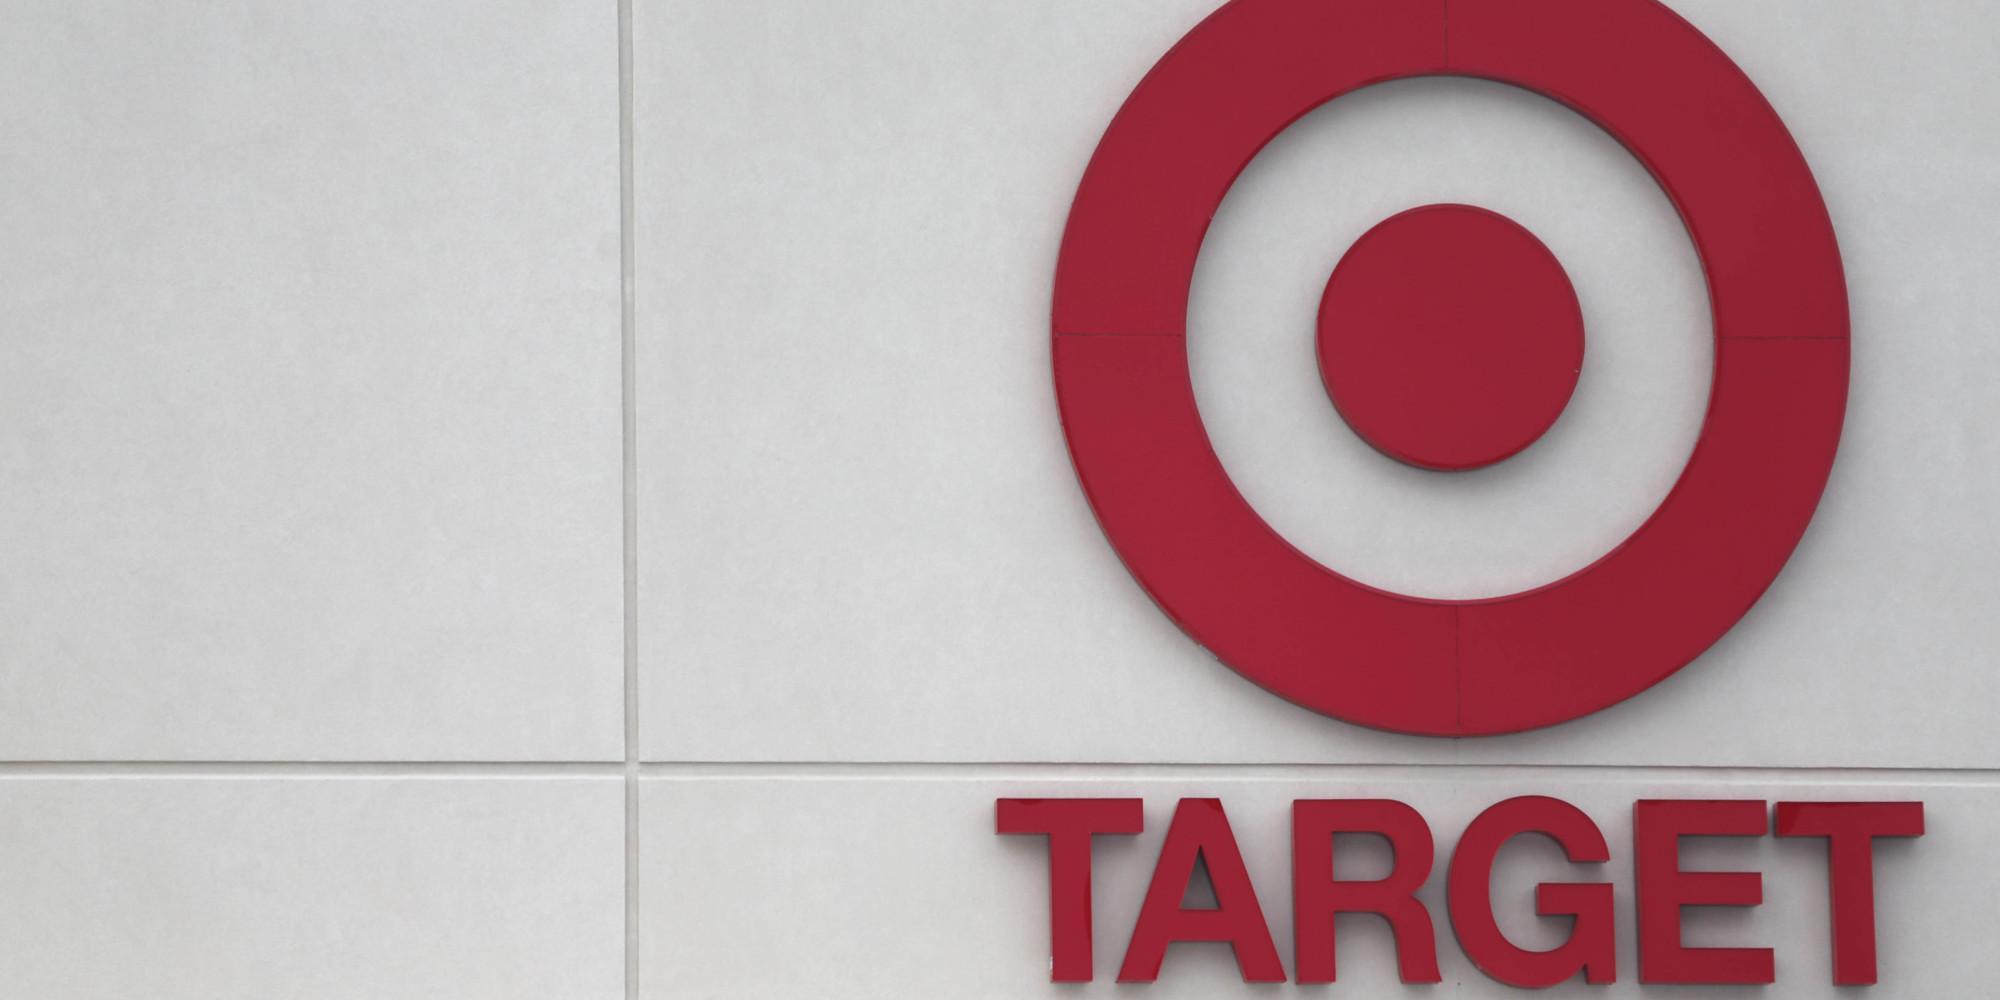 target co0m